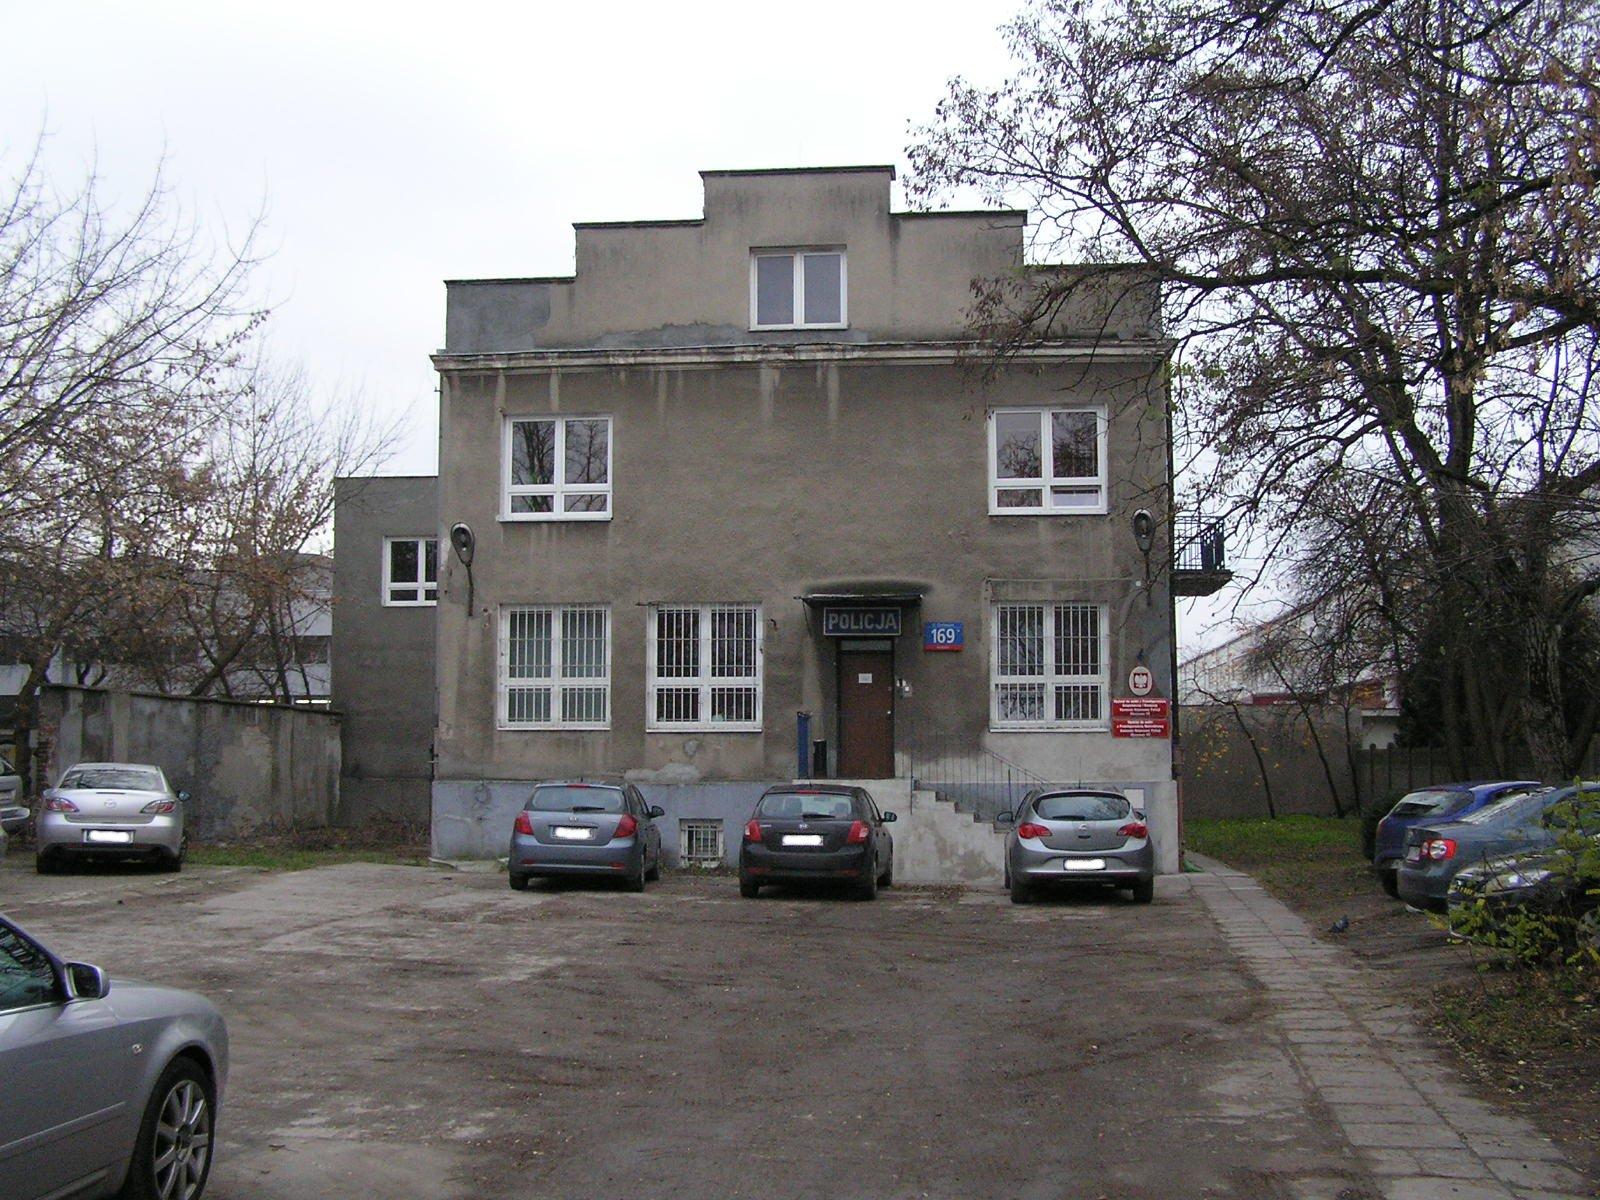 Grochowska 169